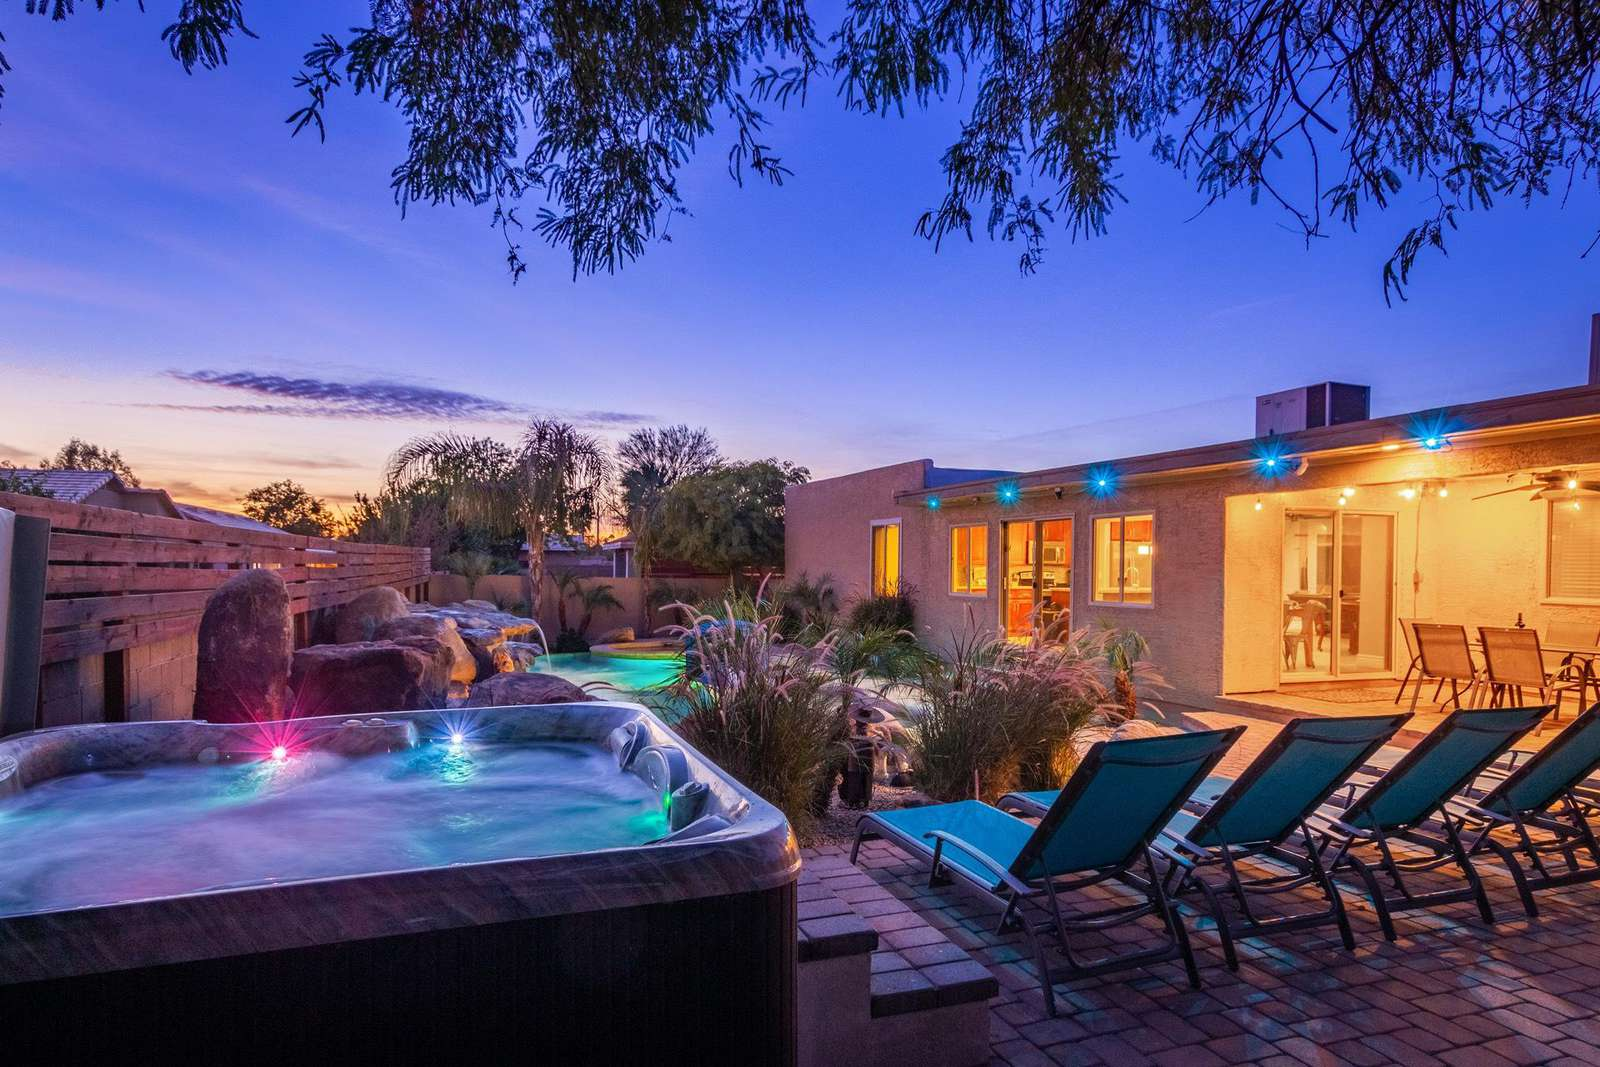 Incredible resort night lighting, full size hot tub.